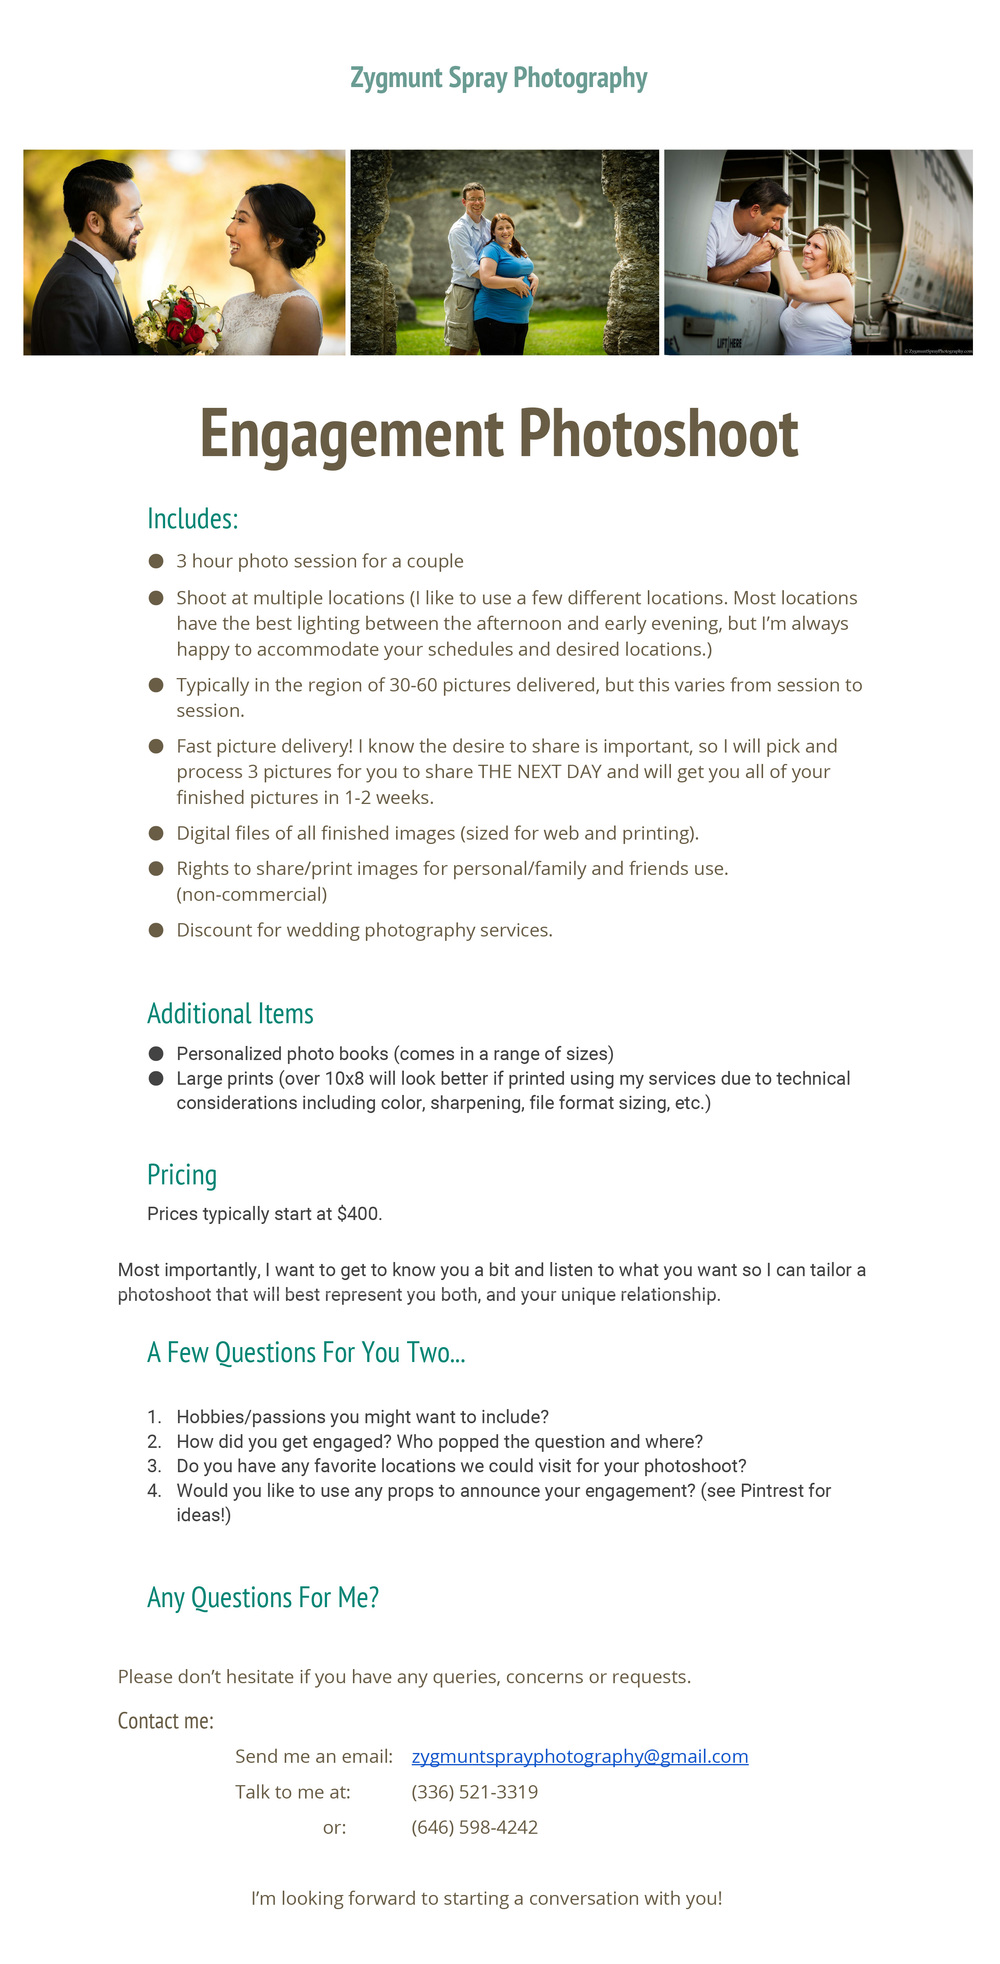 Information Sheet for Engagement Photoshoot - Zygmunt Spray Photography.jpg